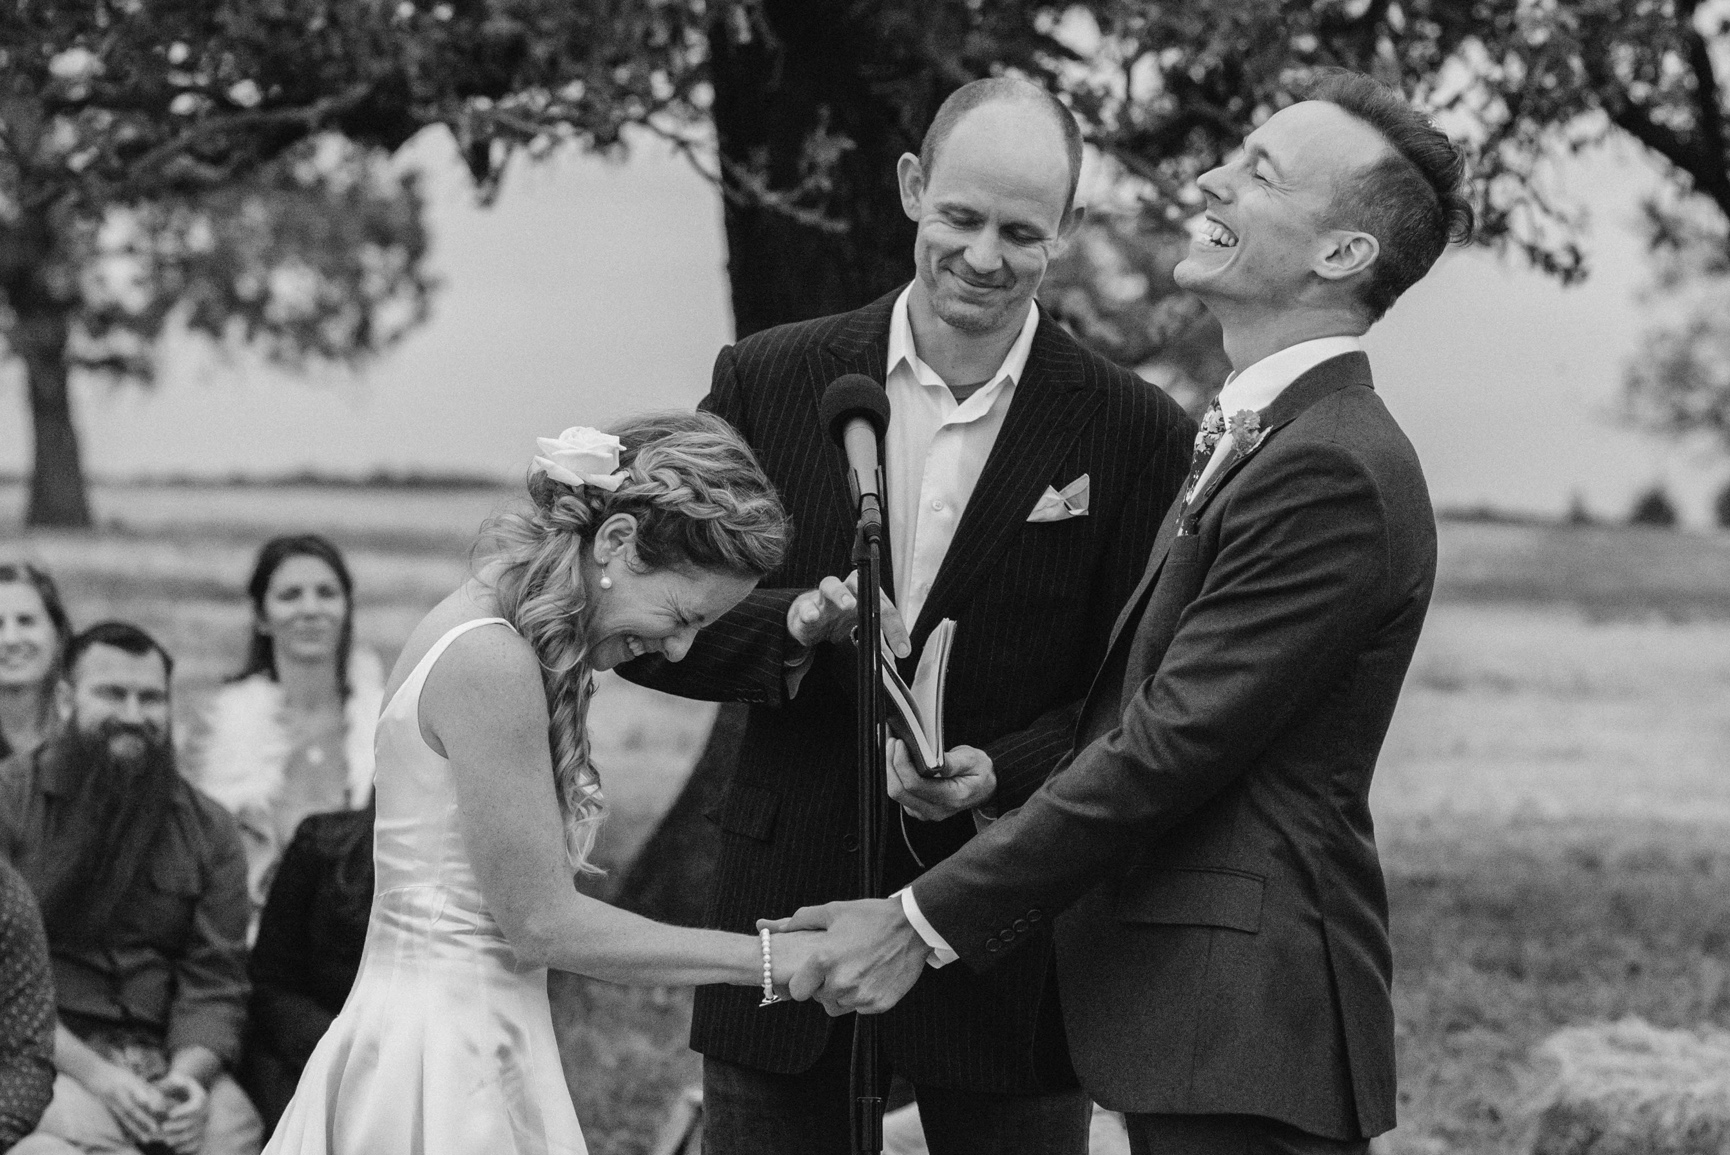 austin-texas-wedding-photography-1778-photographie-02.jpg